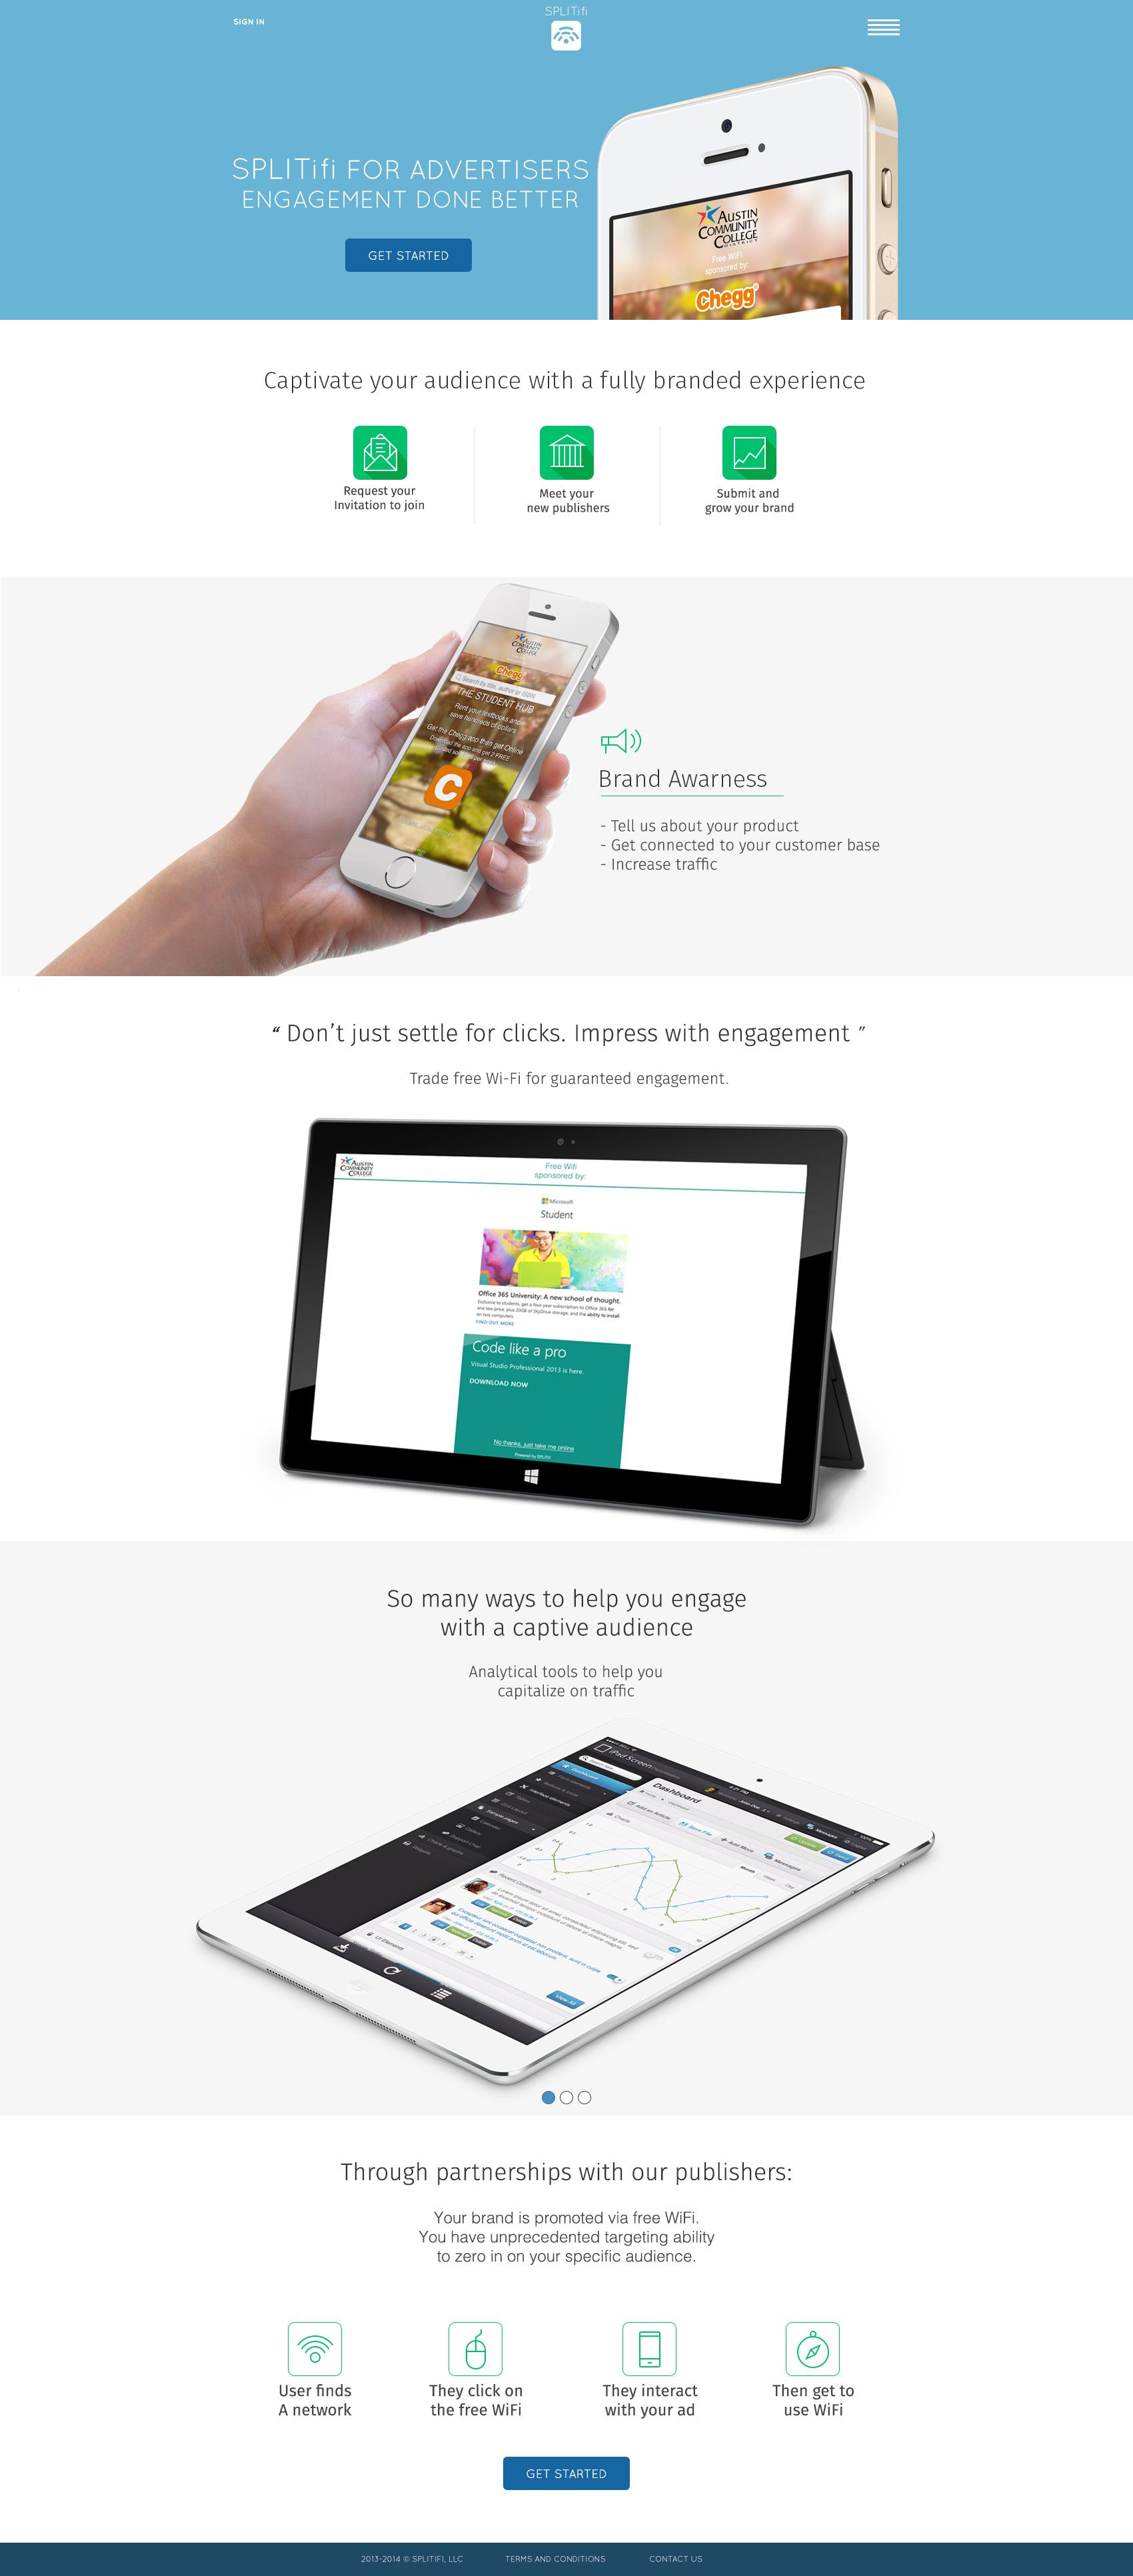 SPLITifi Ad Page.jpg